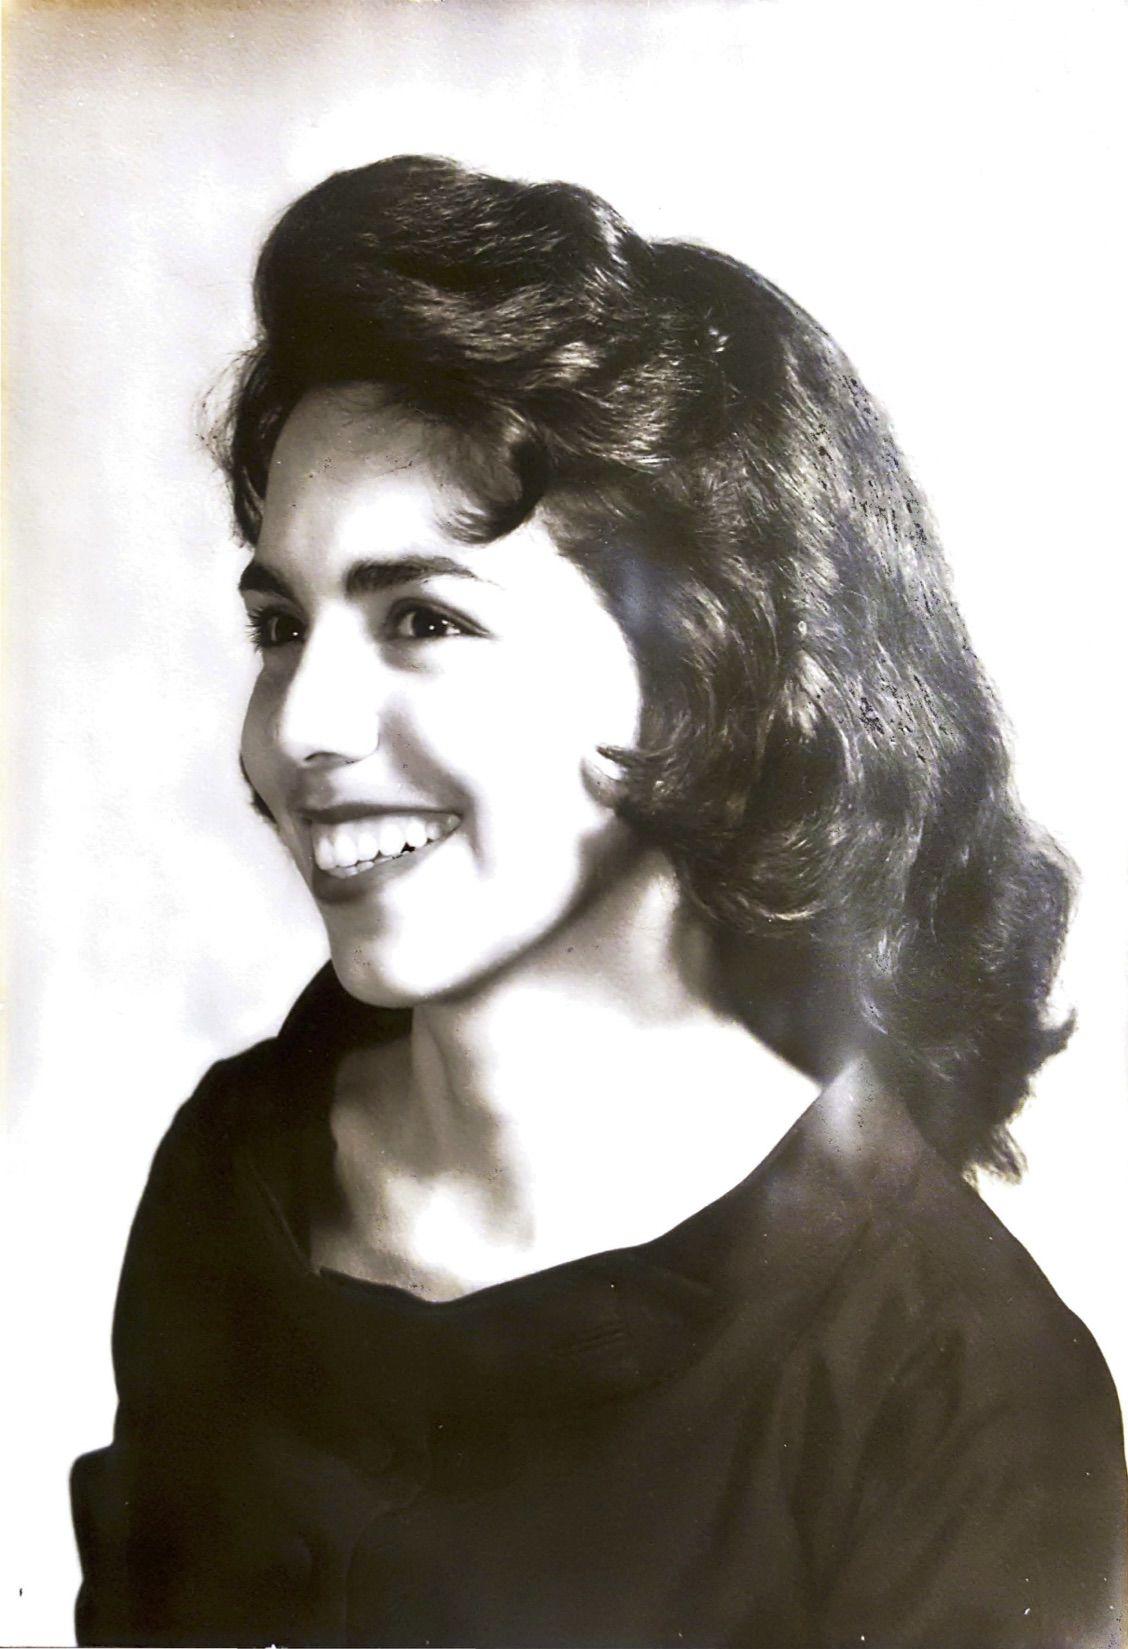 Frances E. Collazo, 85